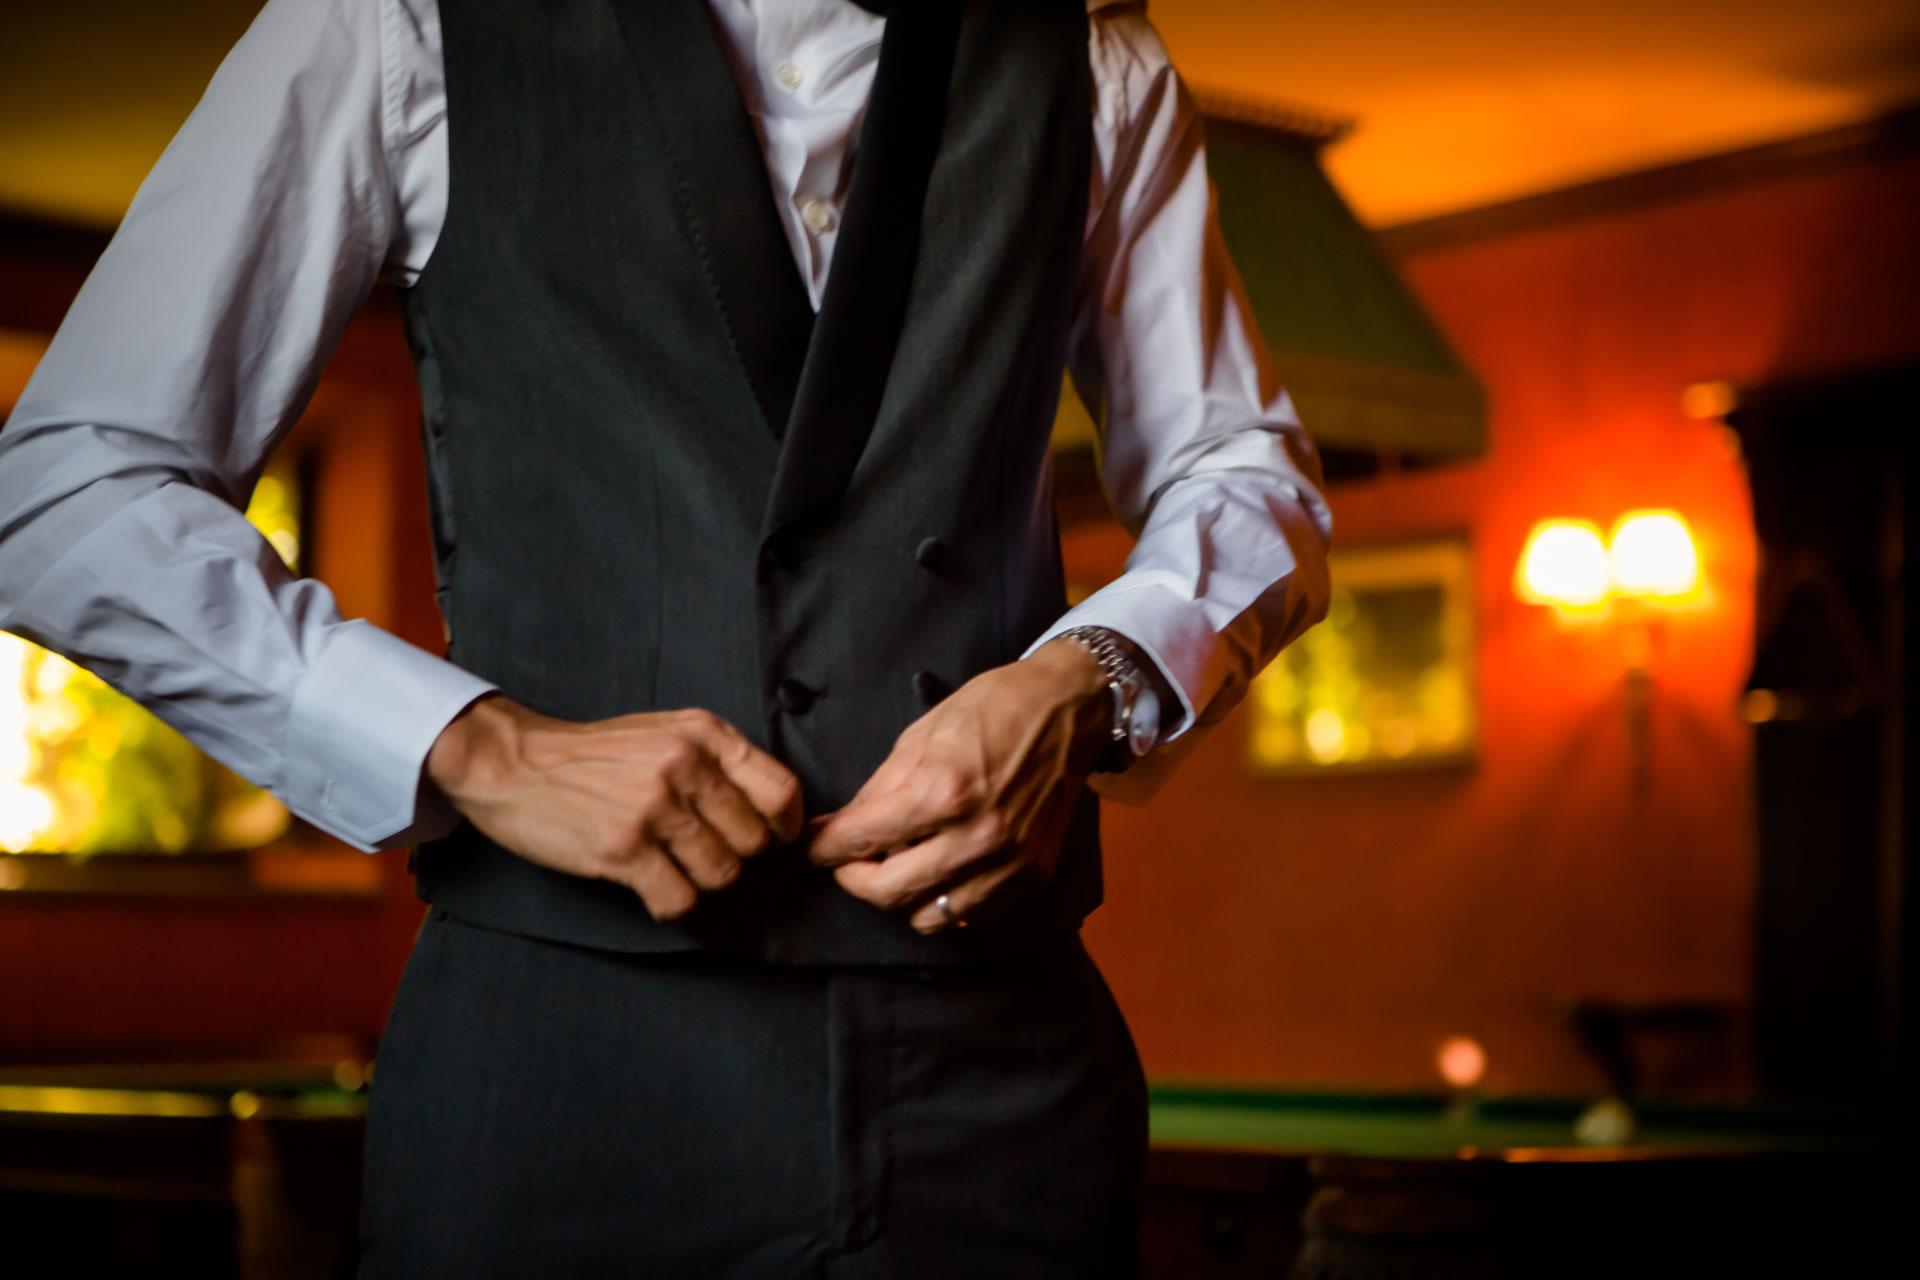 Preparation - 7 :: Luxury wedding at Il Borro :: Luxury wedding photography - 6 :: Preparation - 7